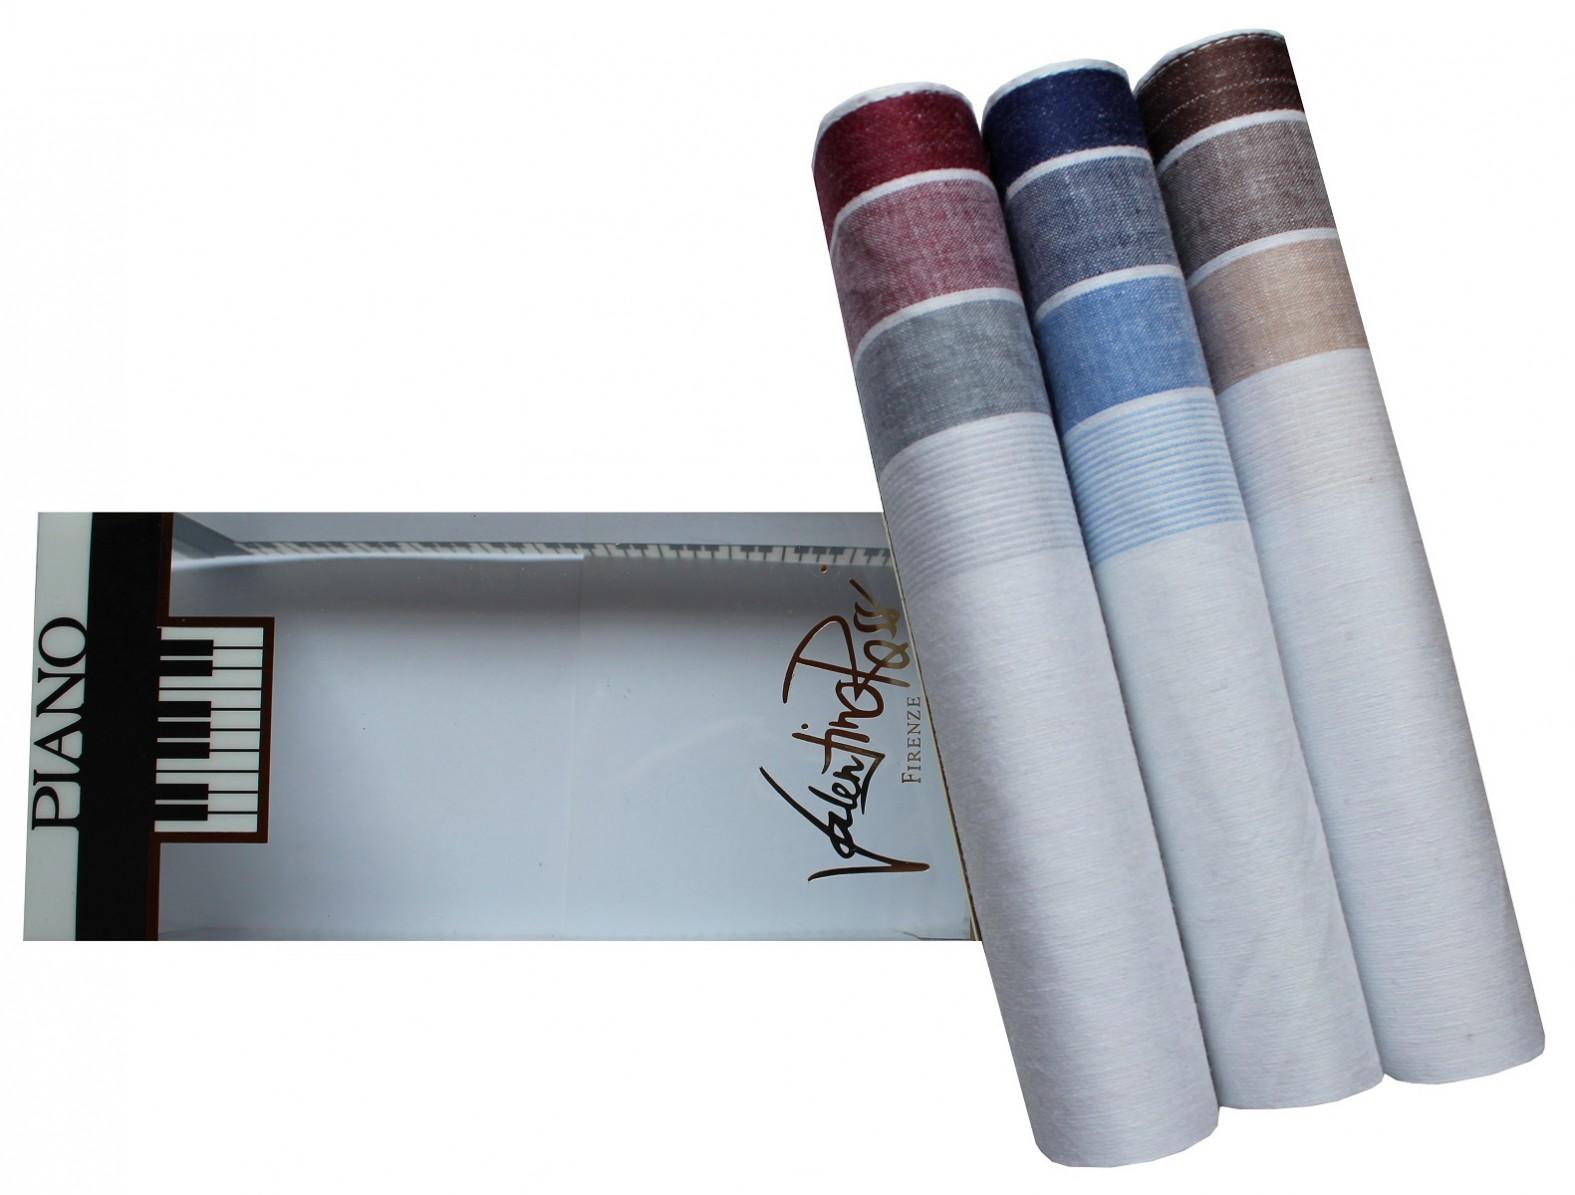 Tobeni 3 edle herren stoff taschent cher in geschenke box for Edle accessoires